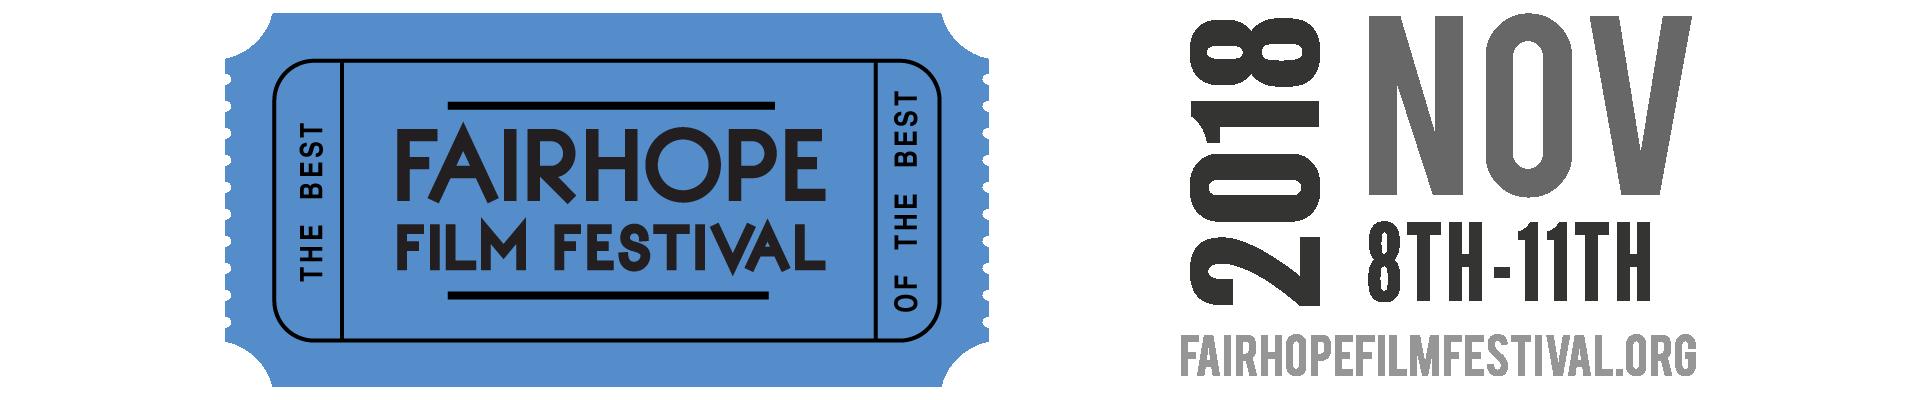 Fairhope Film Festival 2018